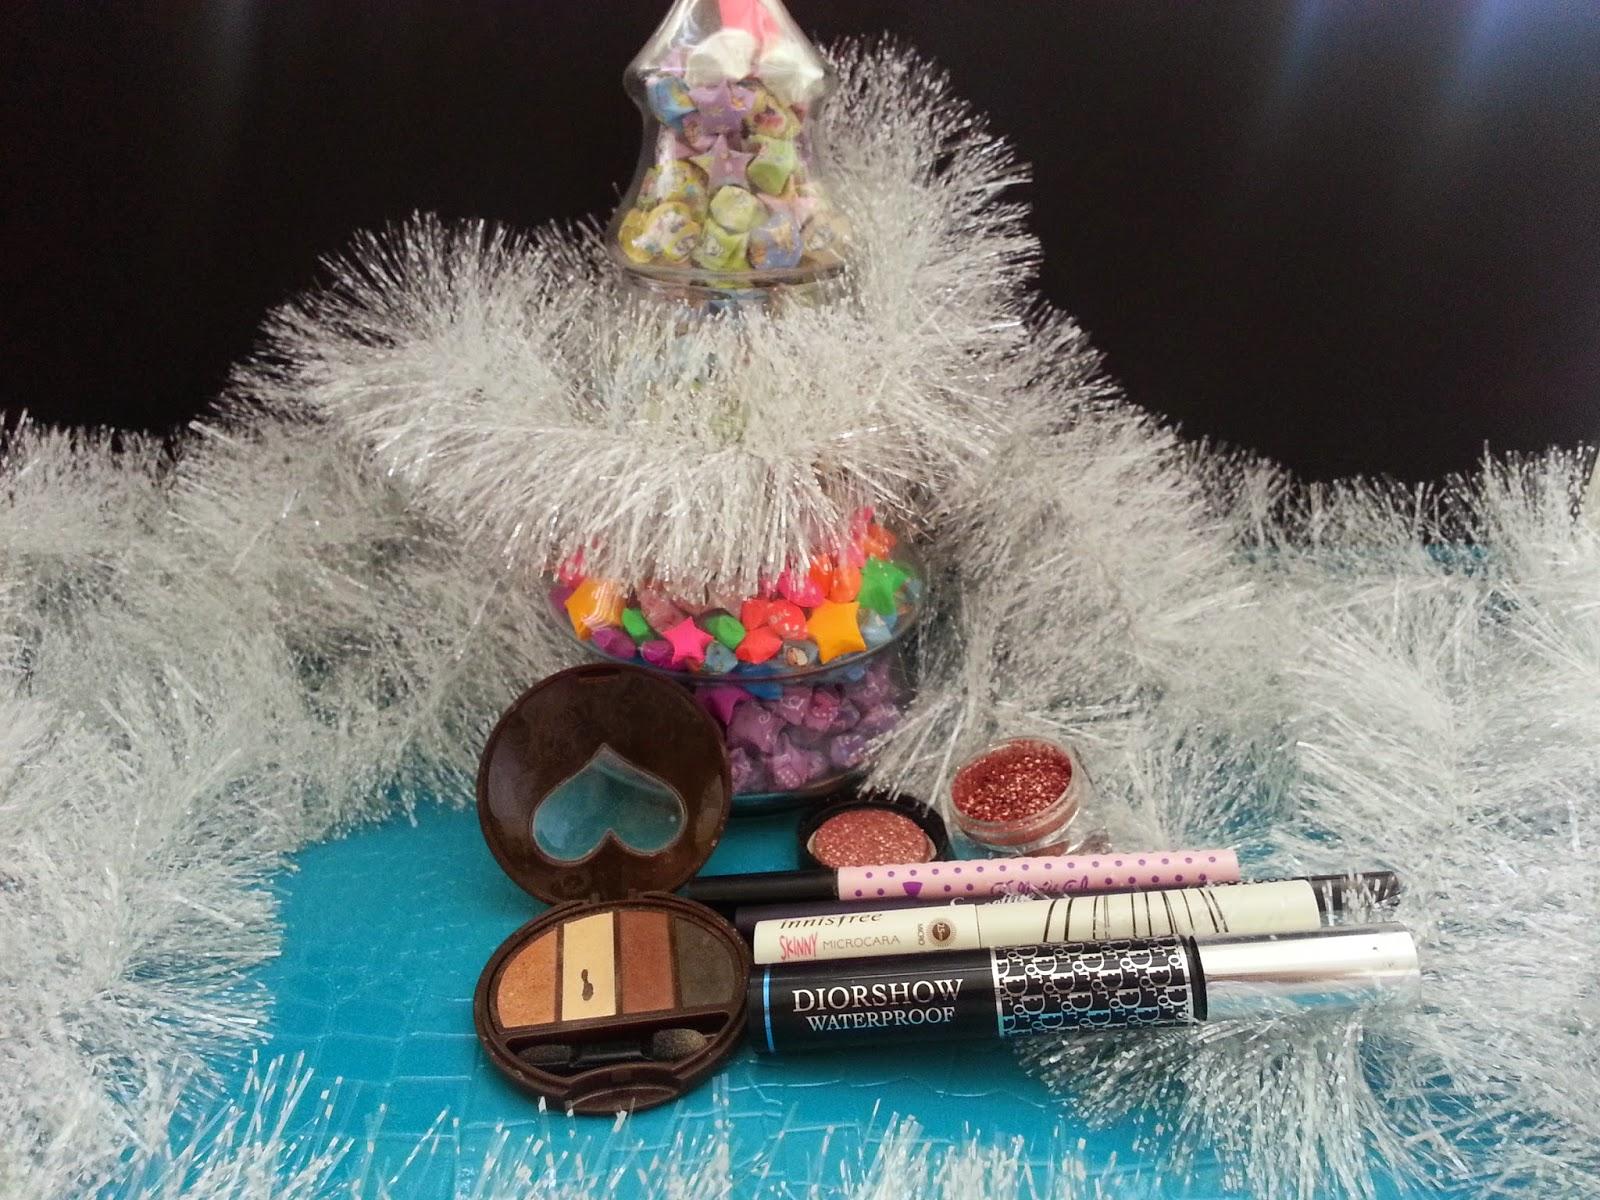 Dolly wink eye shadow and liquid liner, Diorshow, Innisfree Microcara, pigment, Peripera gel liner